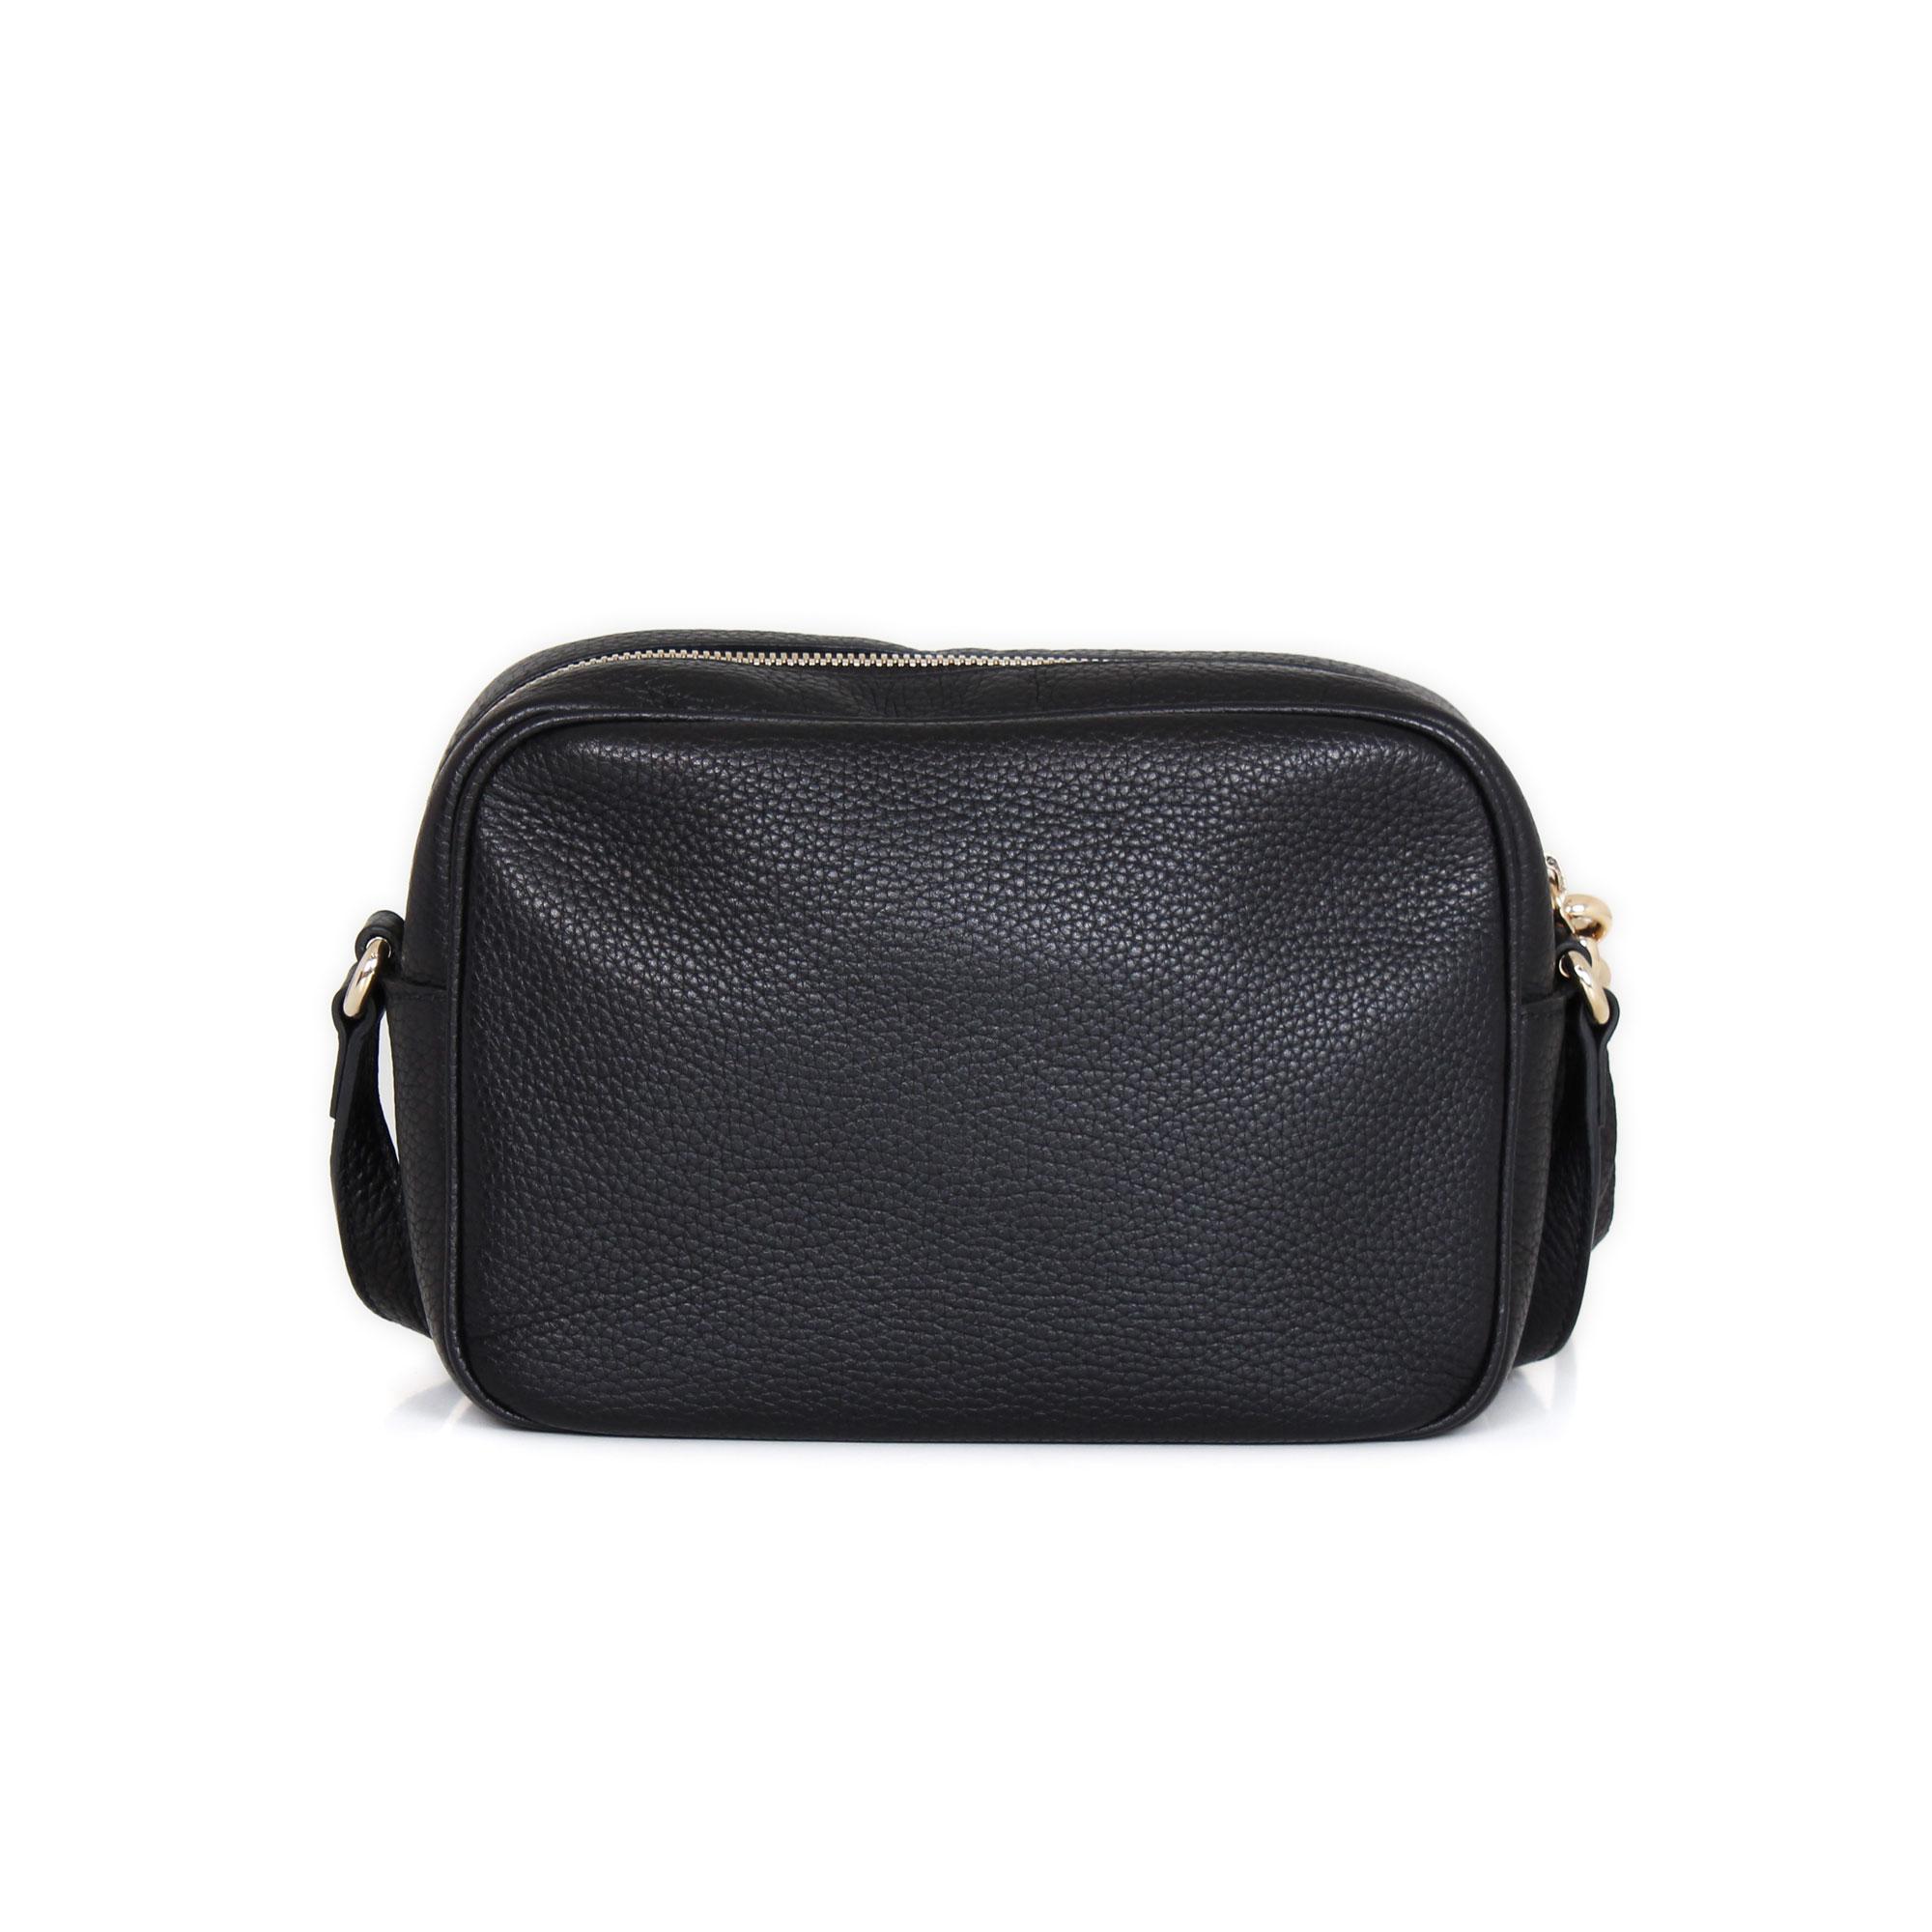 961fd1991089 Soho Small Black Leather Disco Bag Cbl Bags. Gucci Soho 2way Shoulder ...